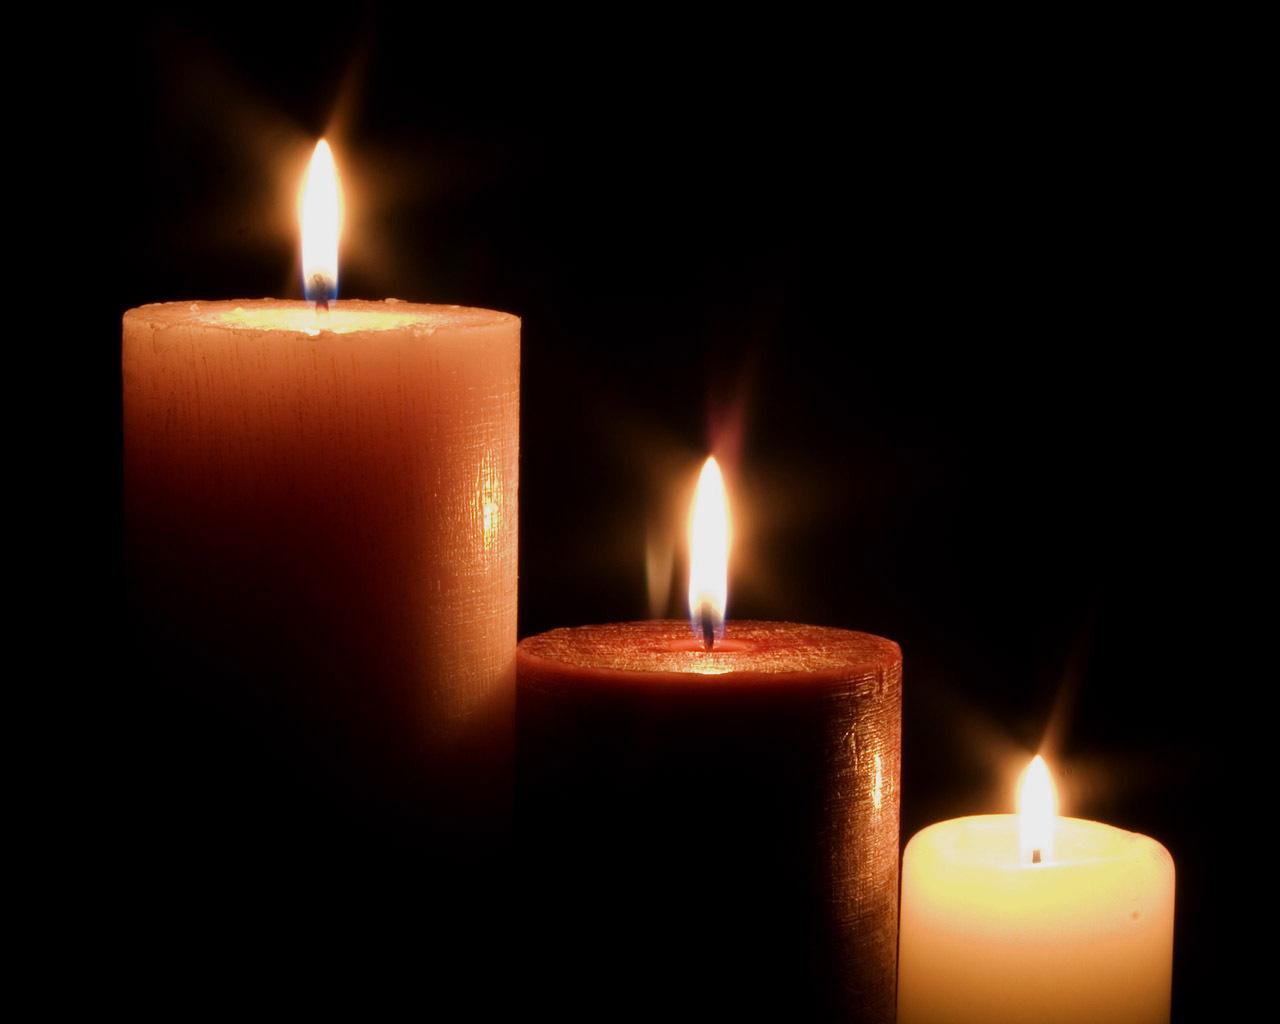 Candle wallpaper   Candles Wallpaper 4091186 1280x1024